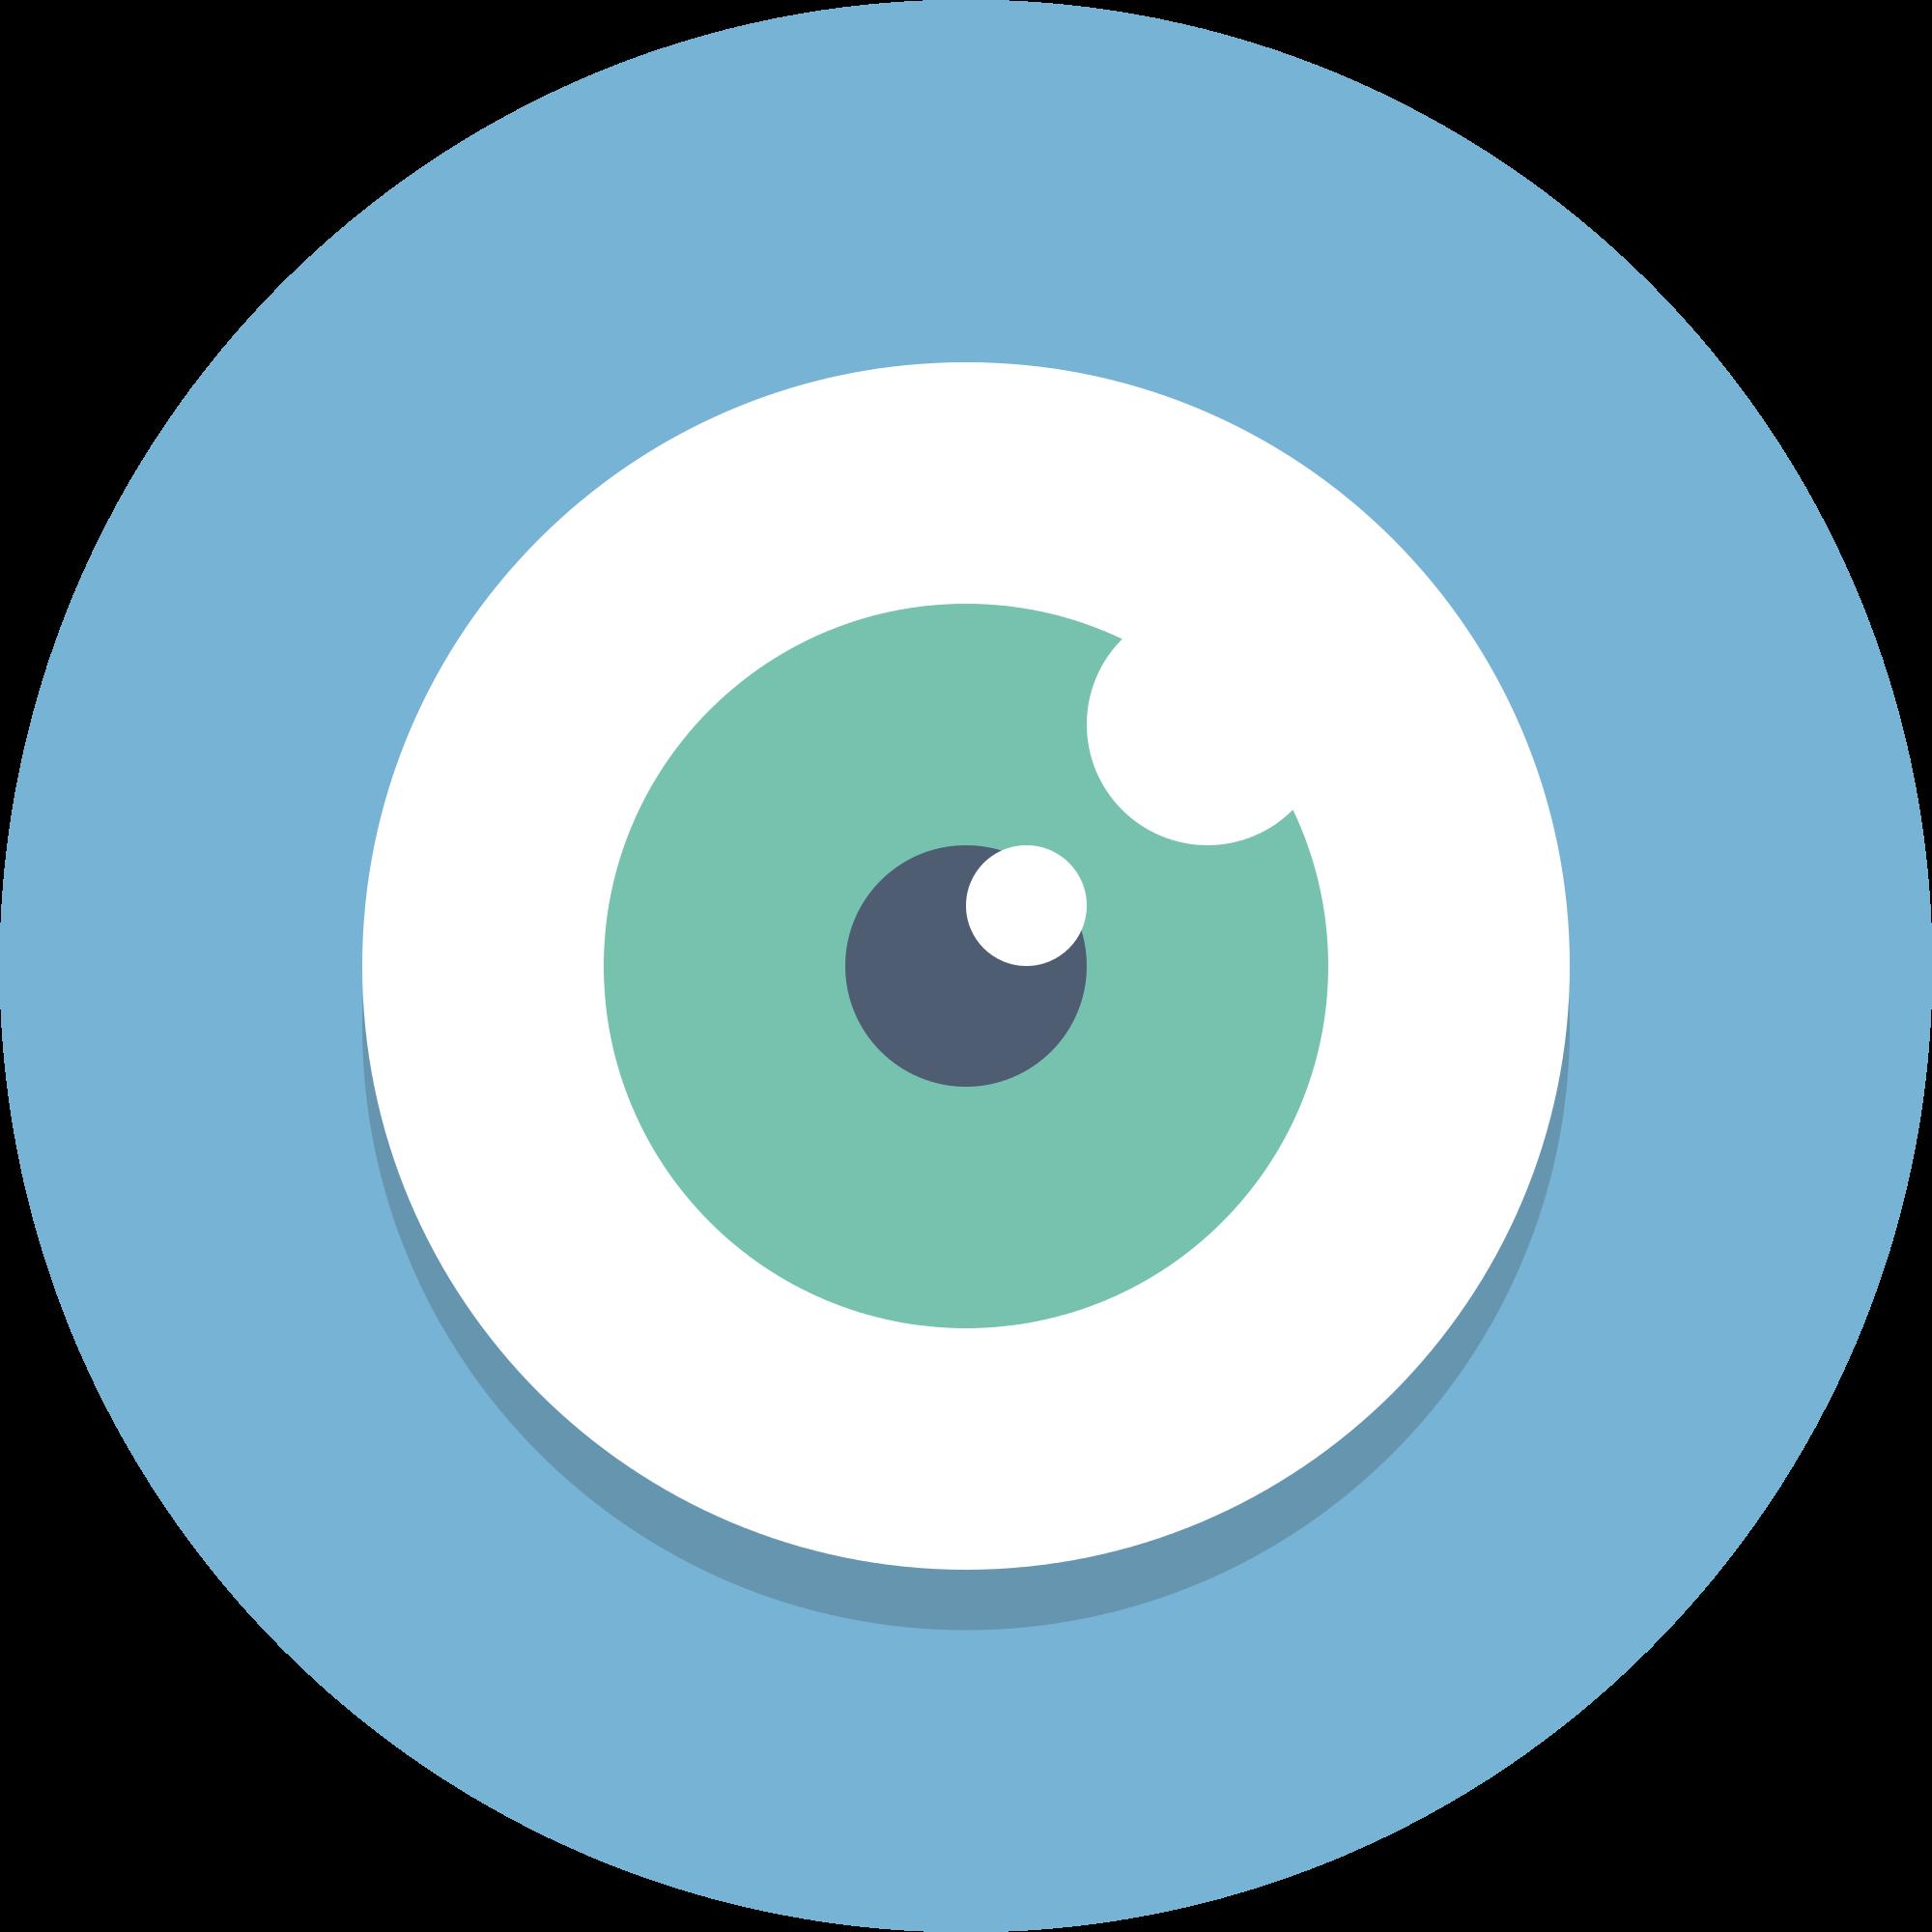 File circle icons eye. Vision clipart vision problem